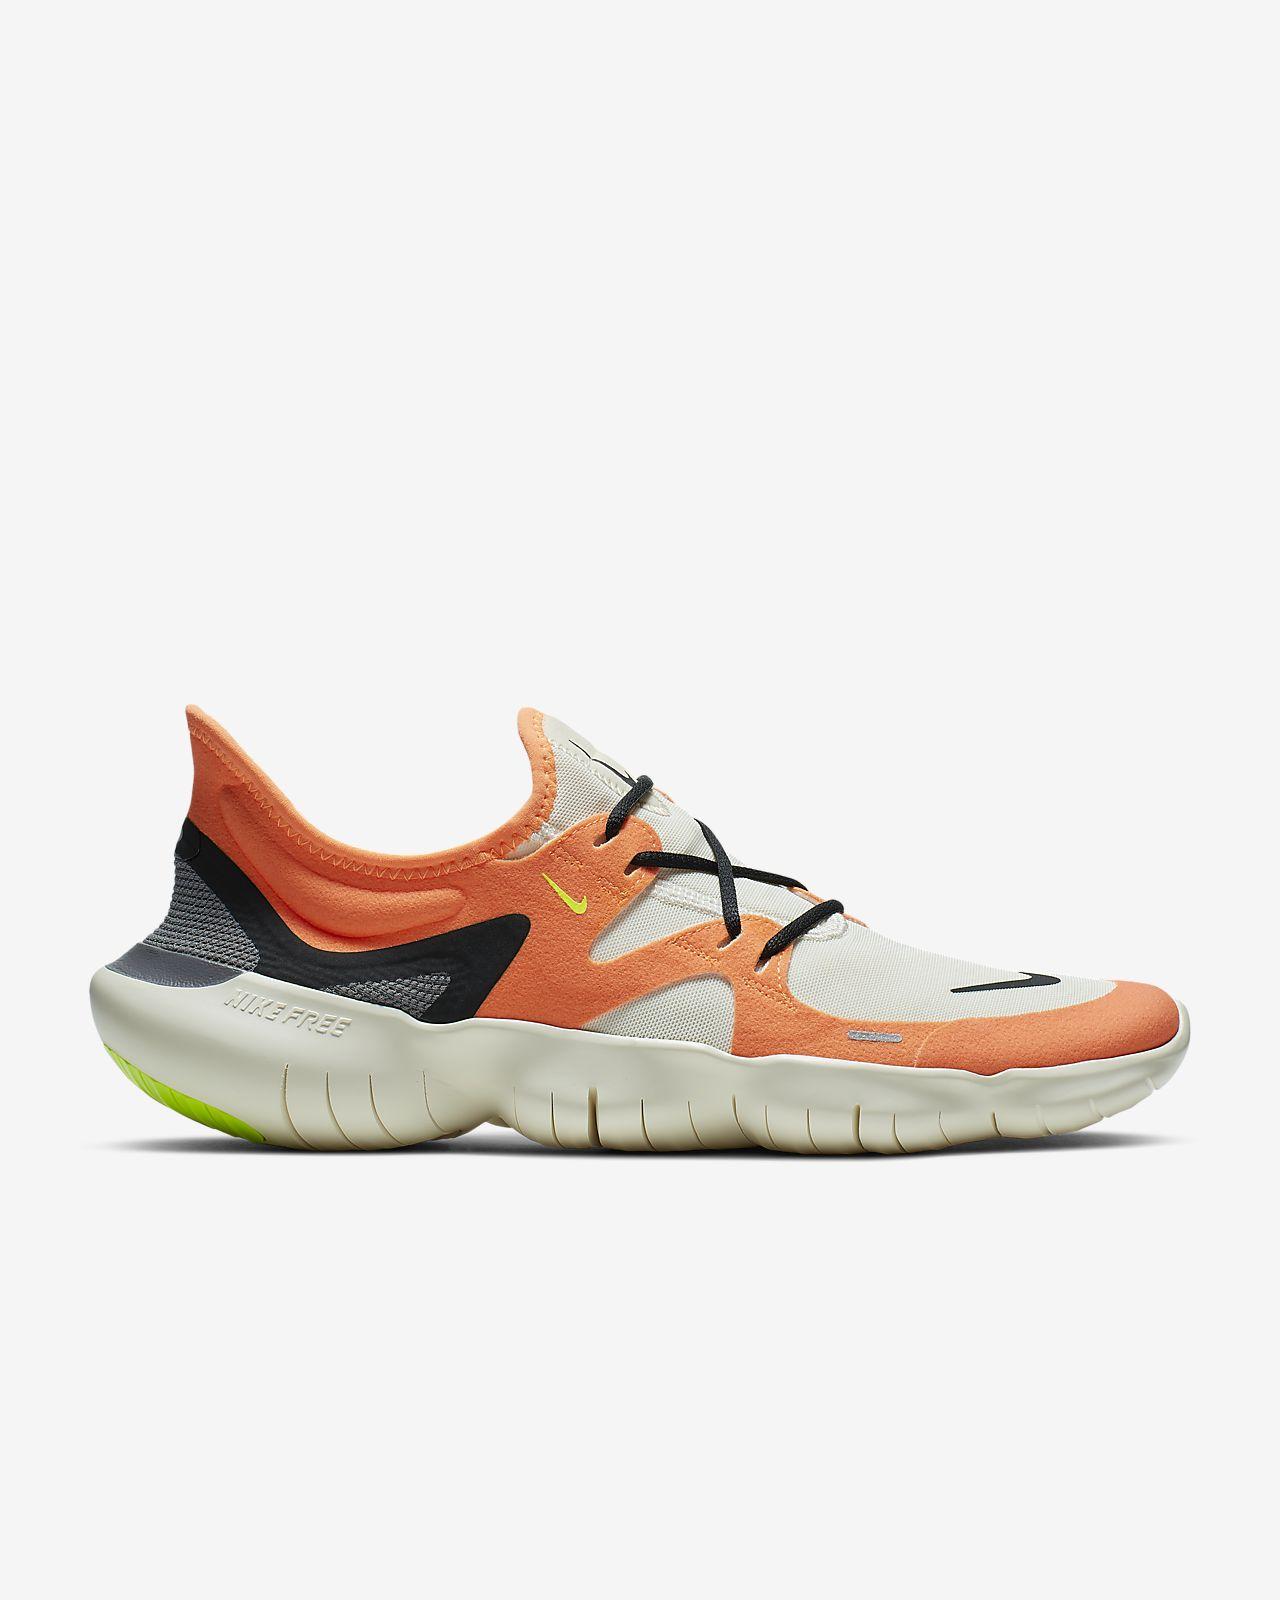 Nike Free RN 5.0 NRG Men's Running Shoe. Nike.com